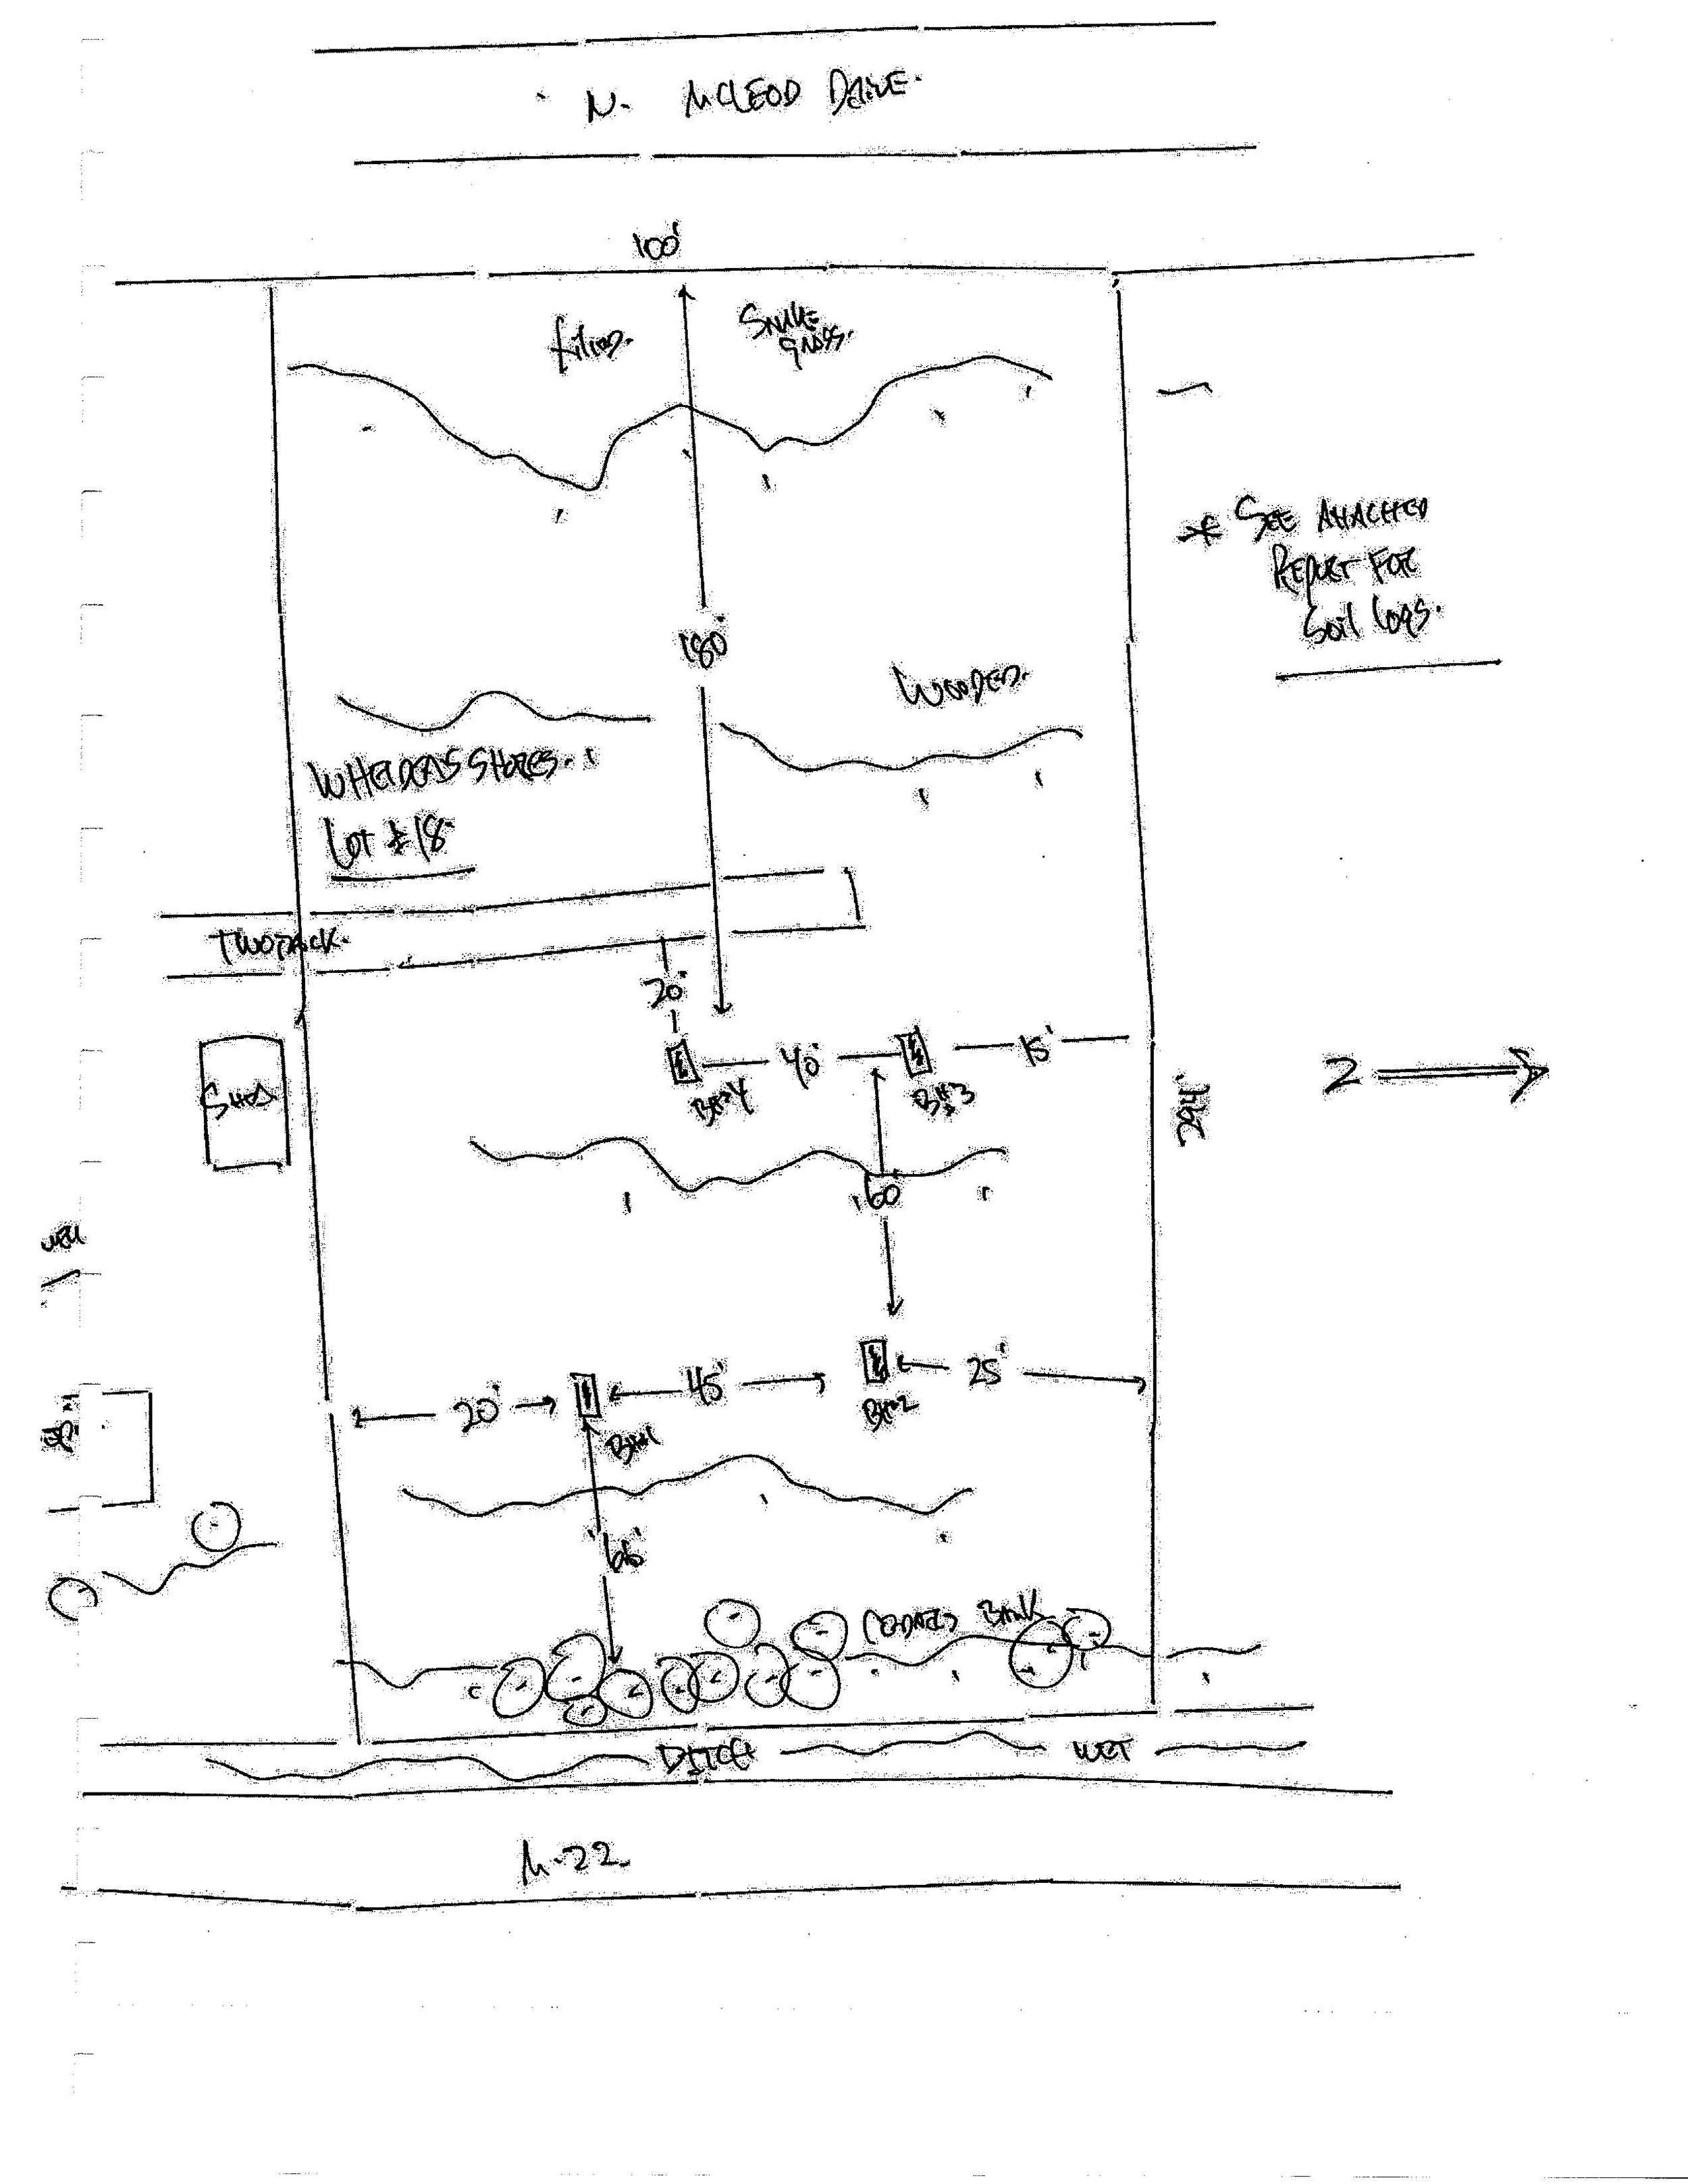 4388 N Manitou Trail, Leland - Marketing packet by Oltersdorf Realty LLC (25).jpg